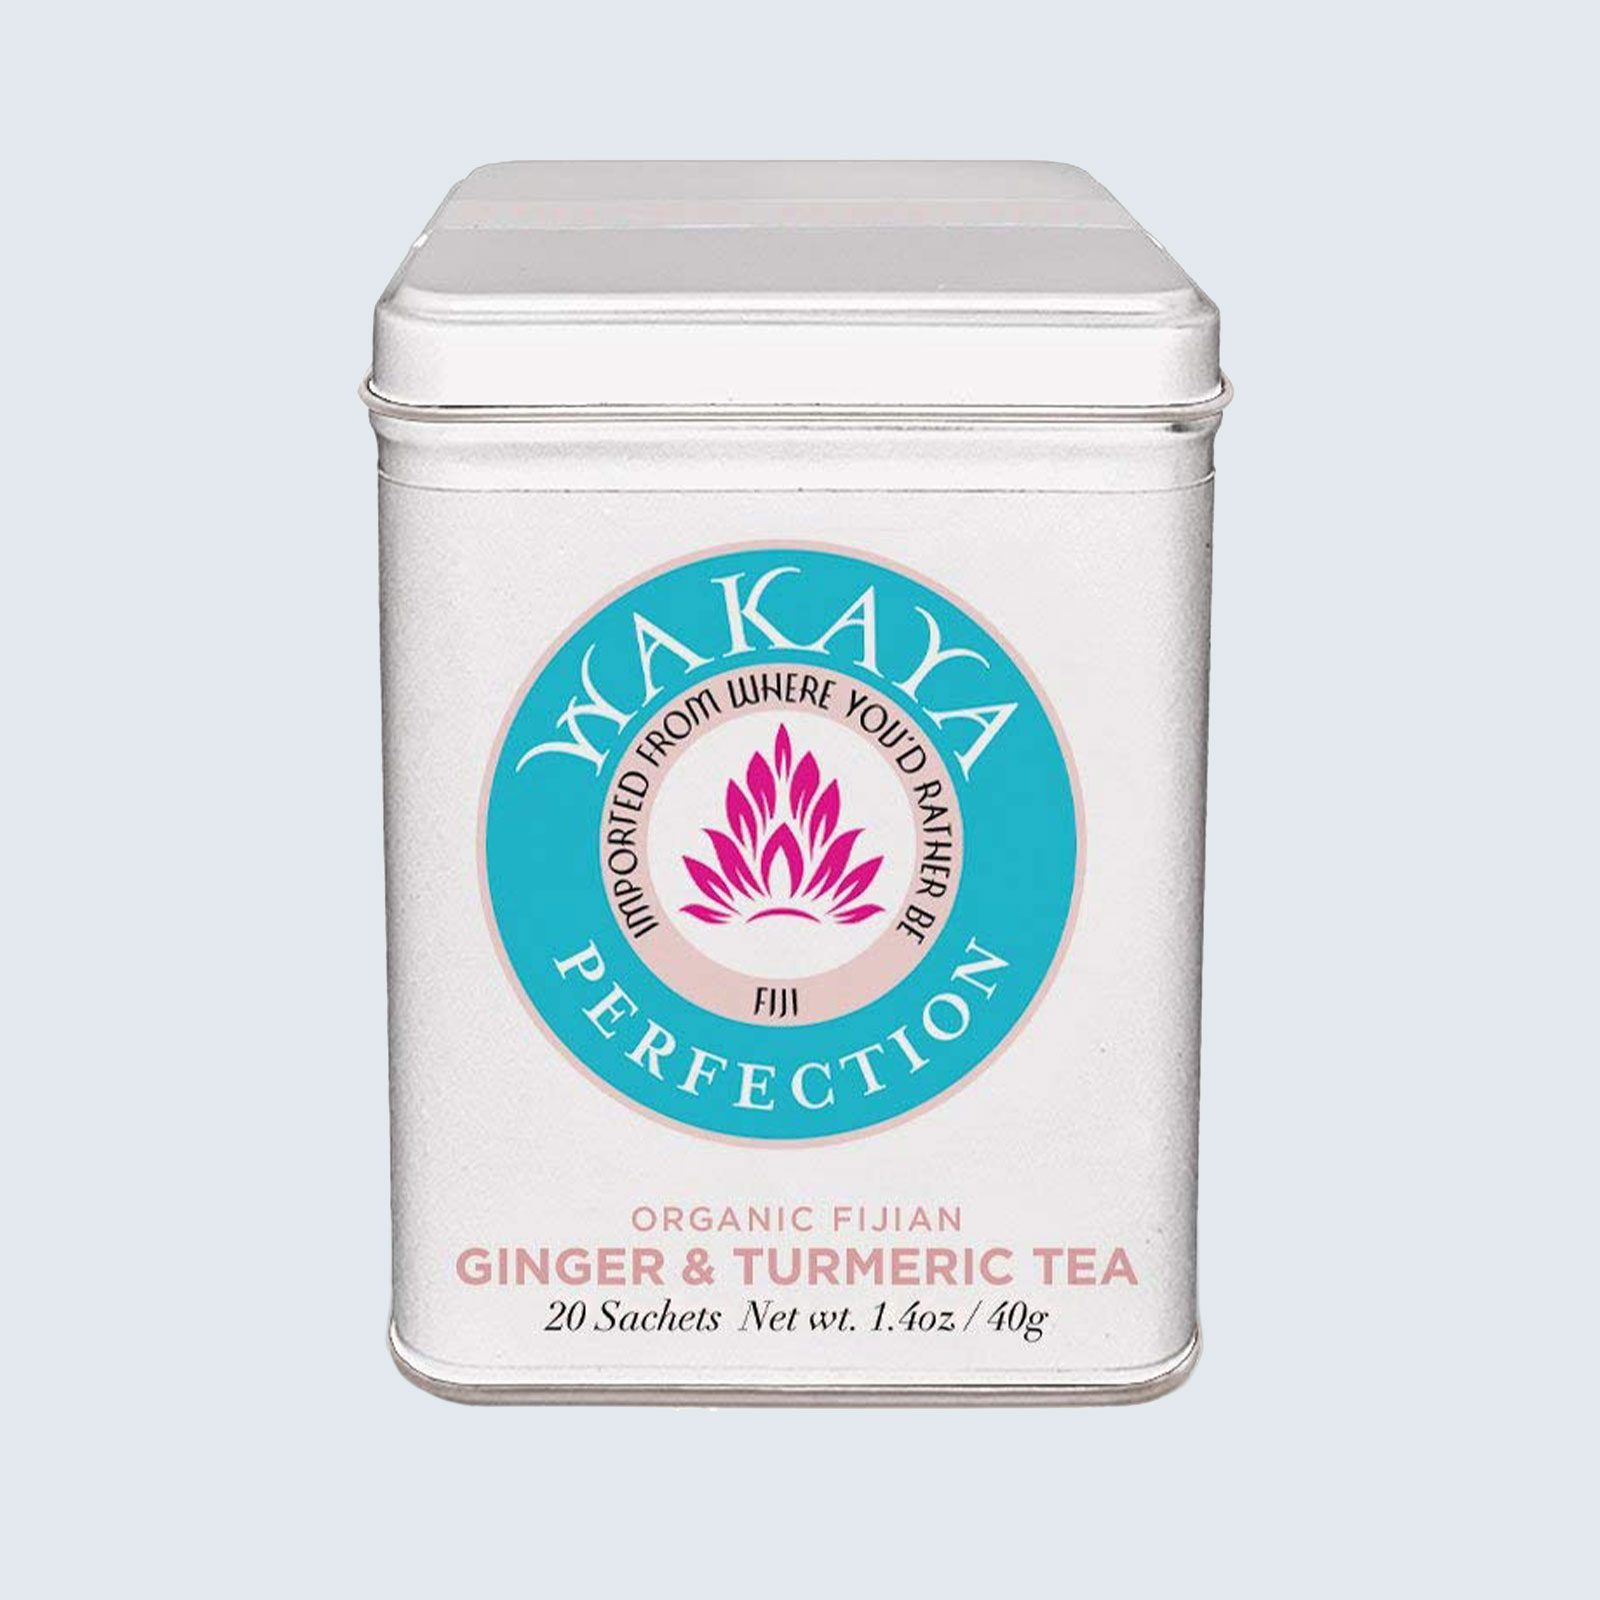 Wakaya Perfection Organic Fijian Ginger & Turmeric Tea